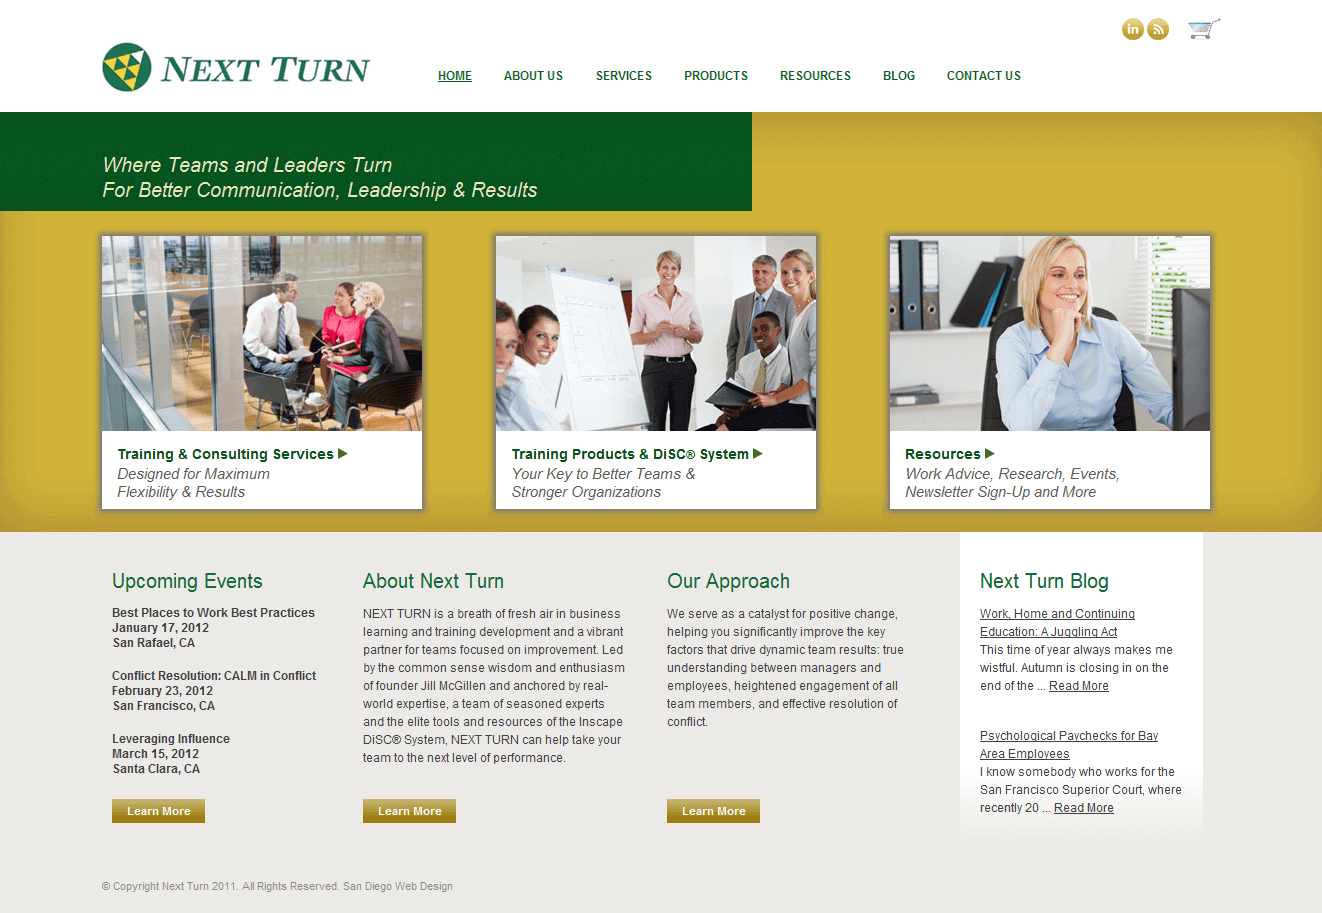 Next Turn Website Design Image